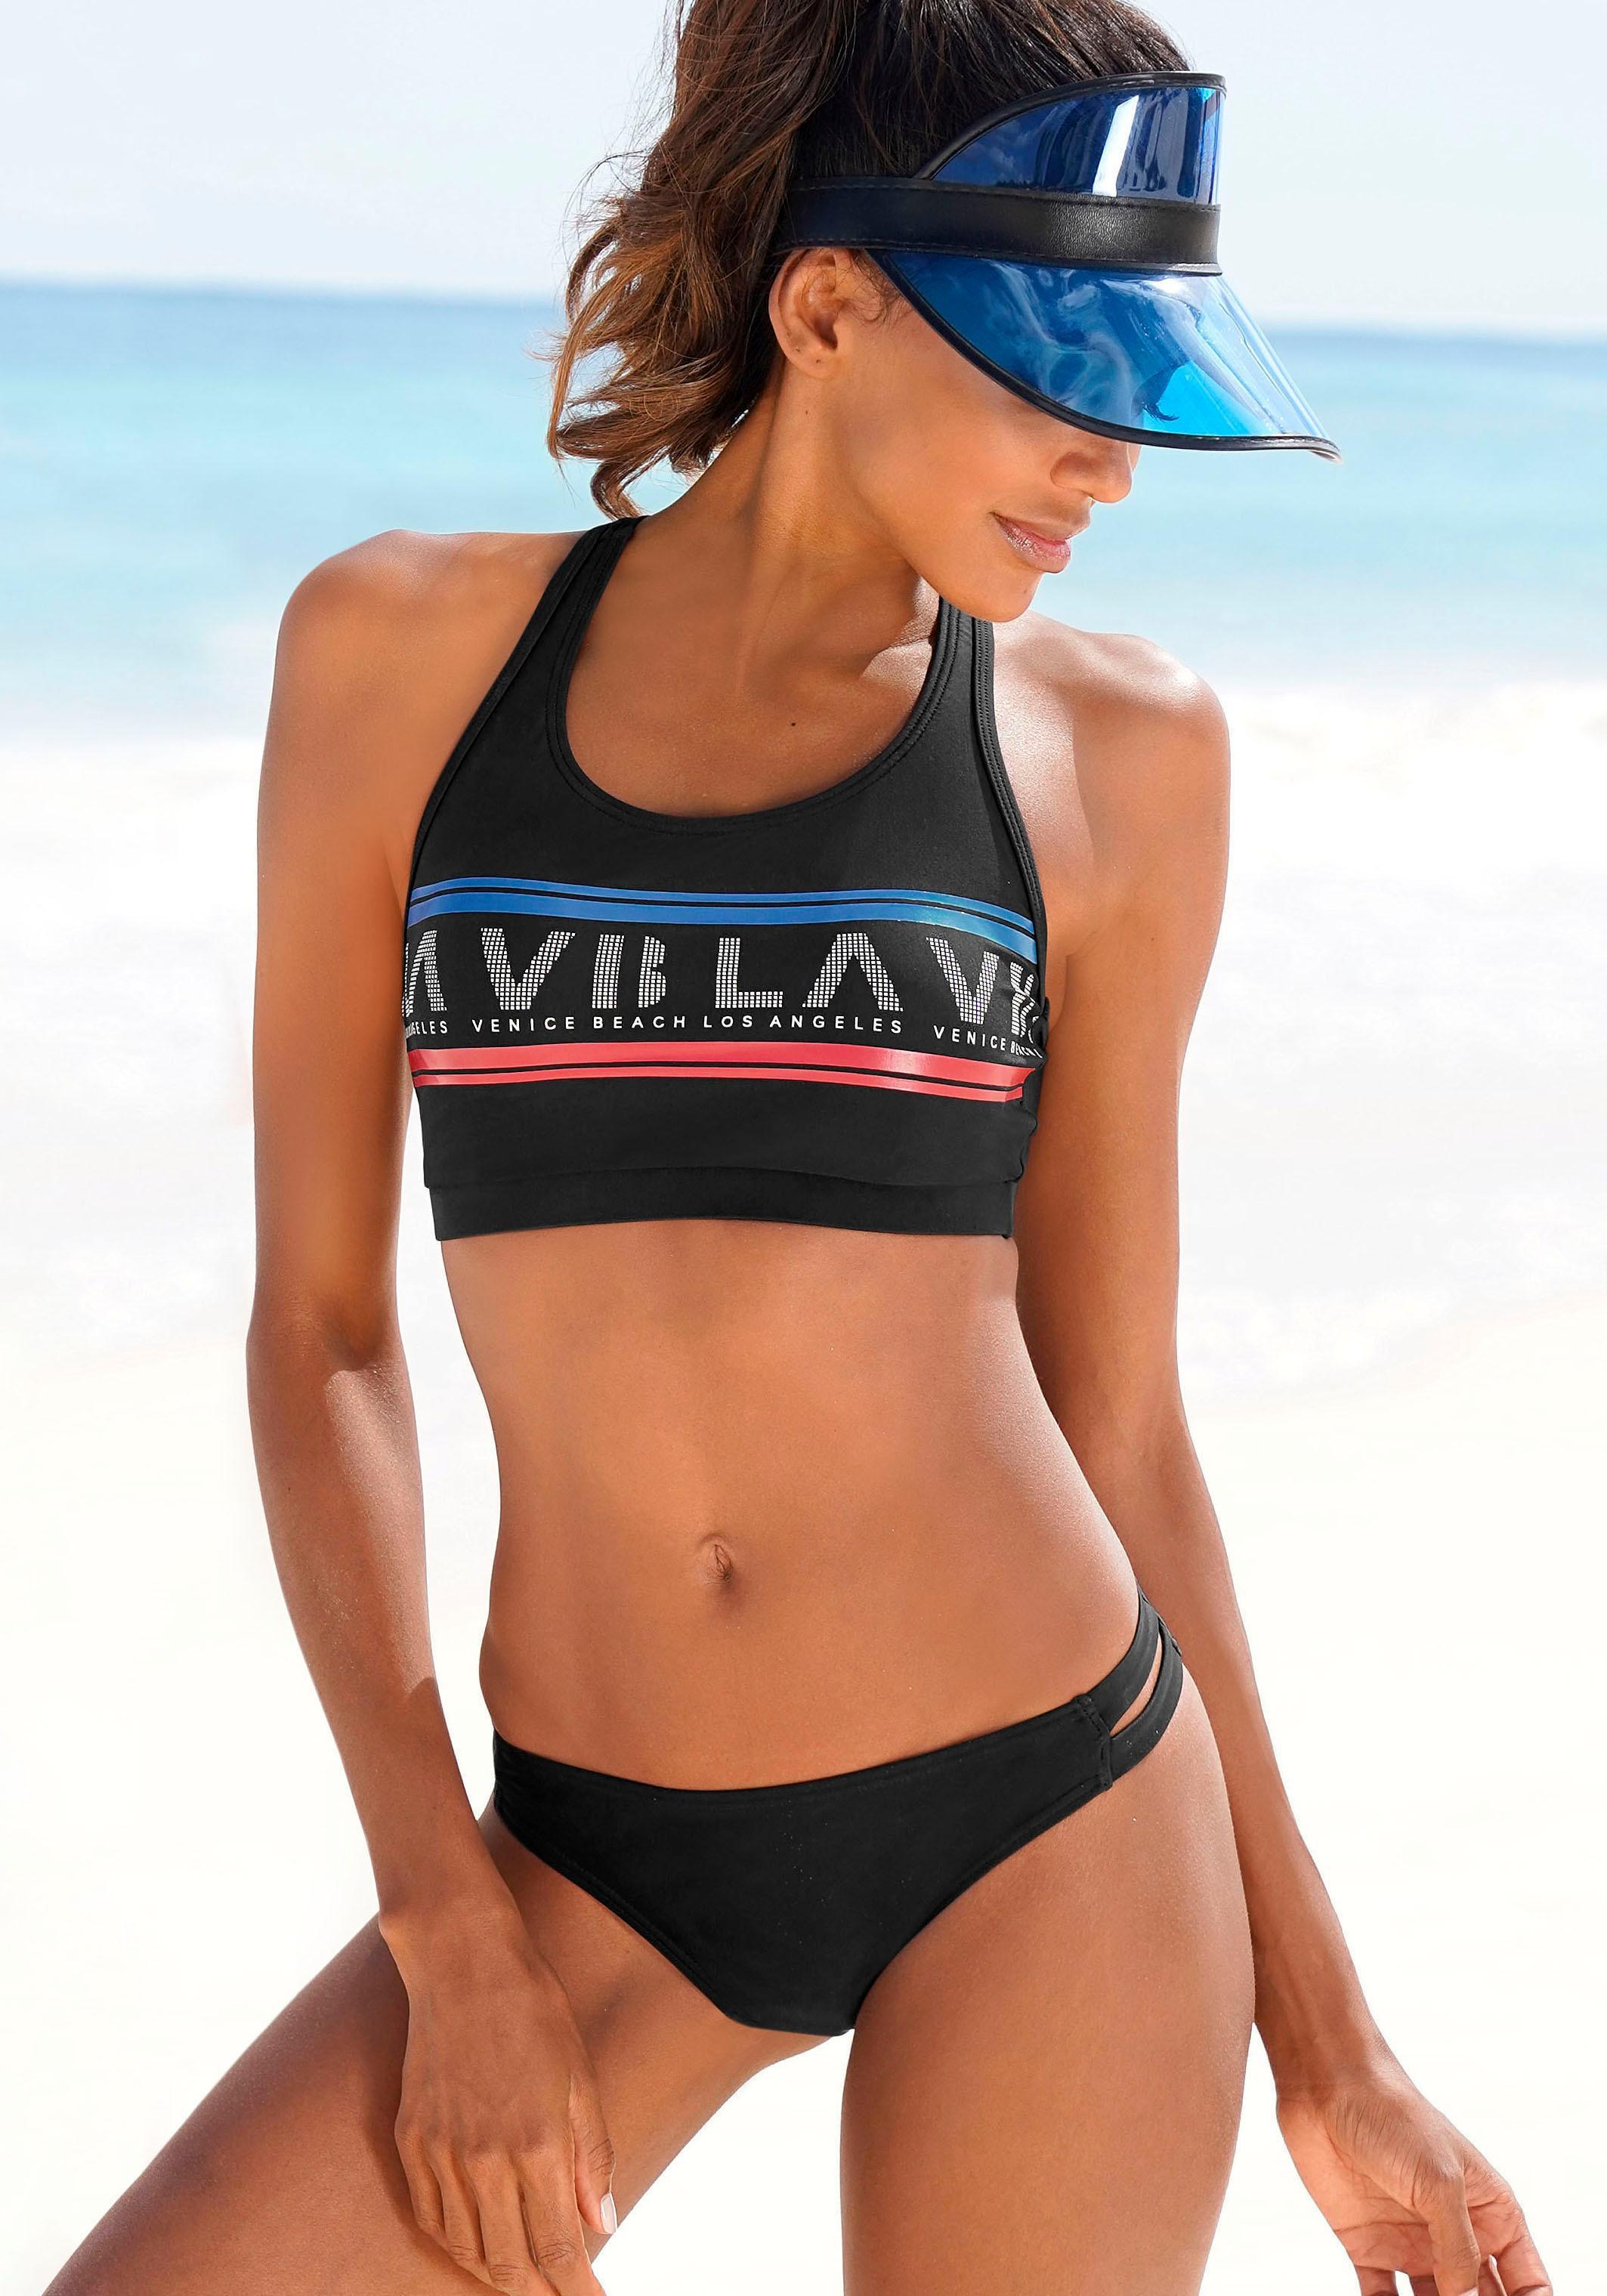 Venice Beach Bustier-Bikini